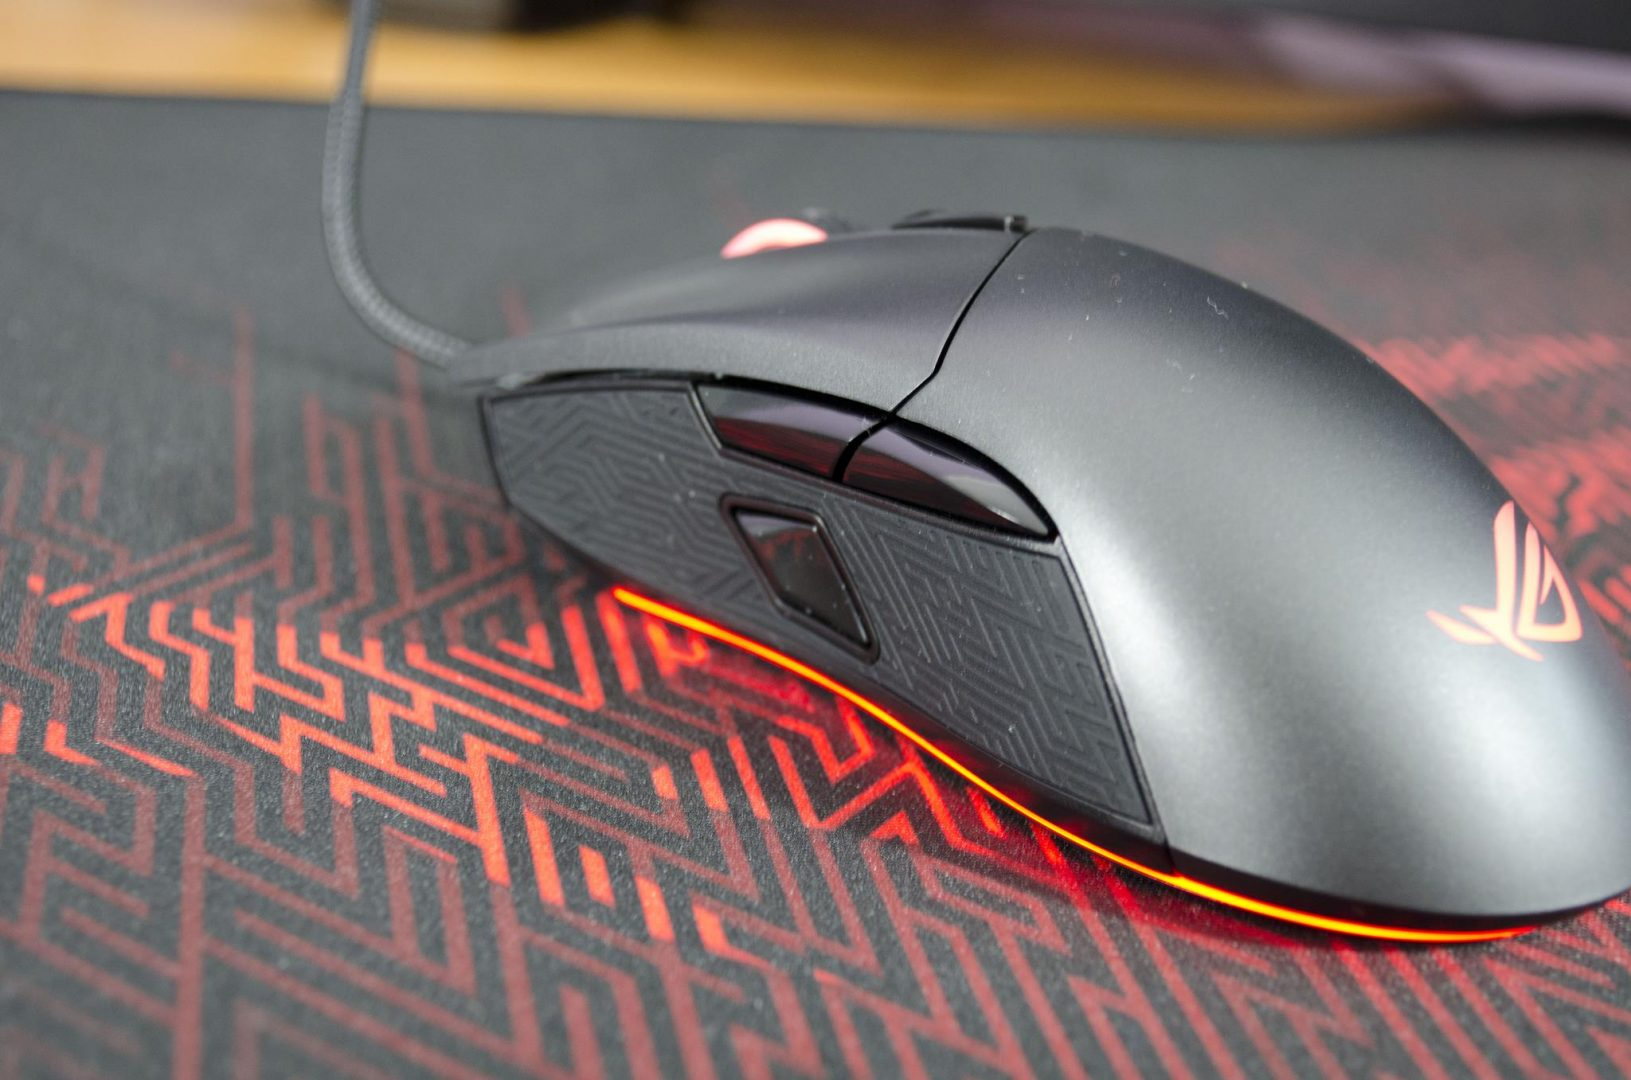 asus rog gladius ii gaming mouse review_2